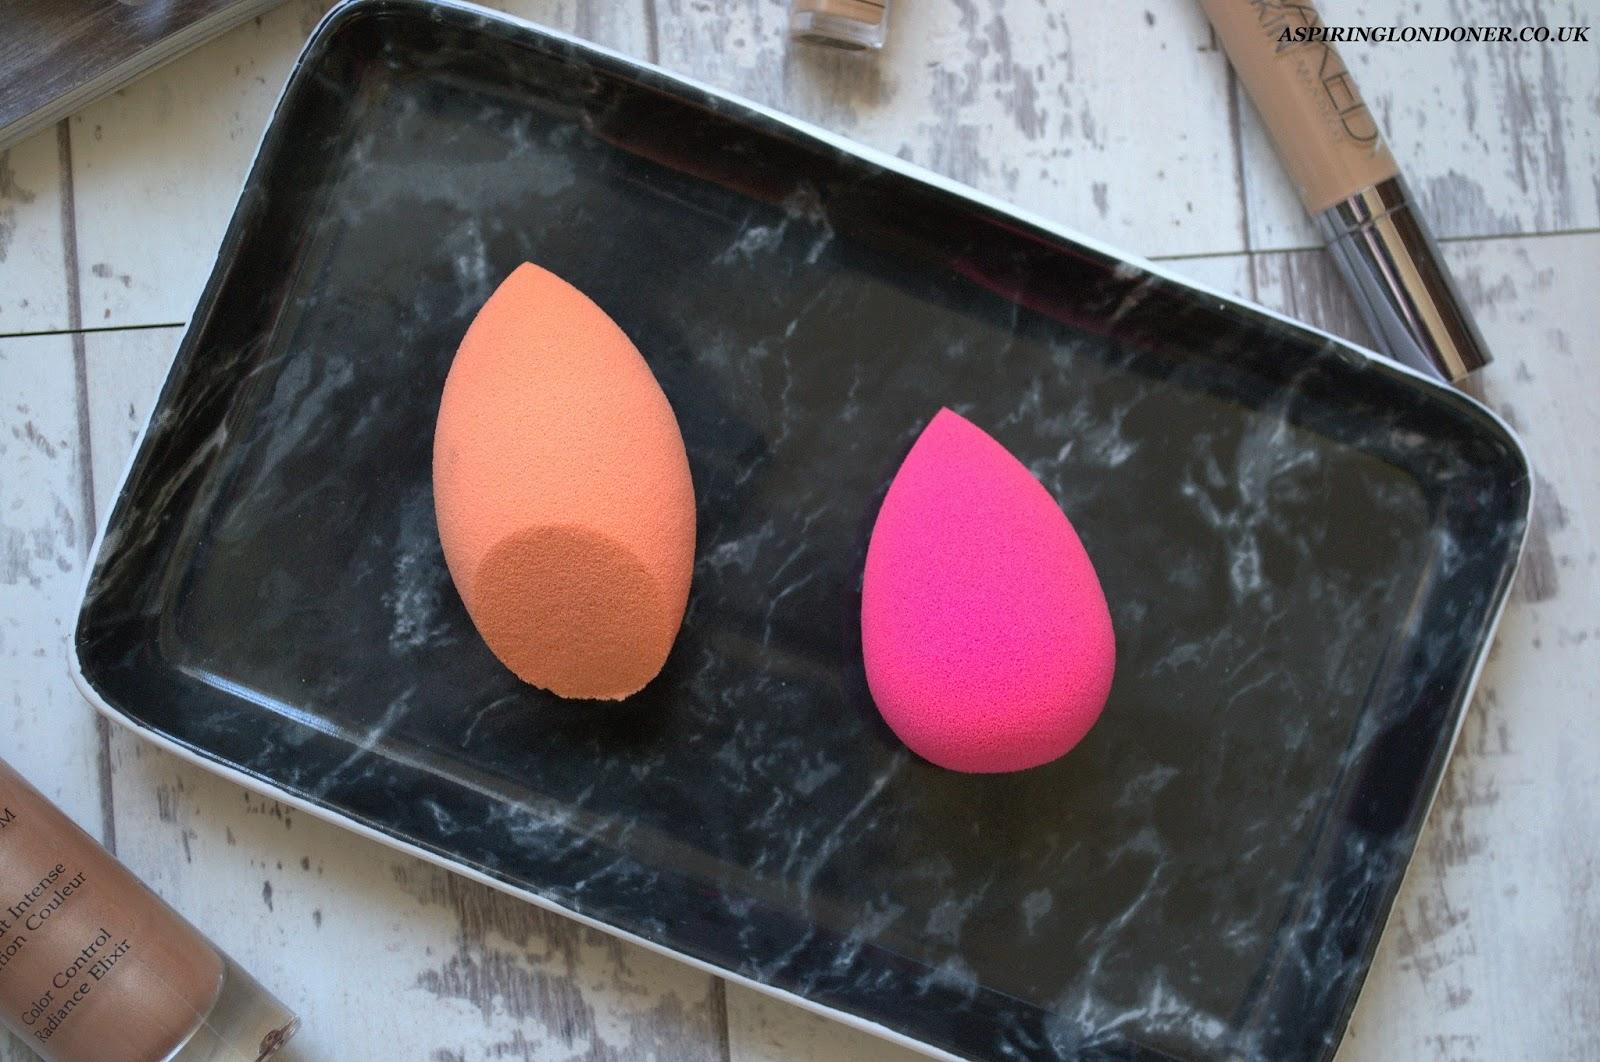 Beautyblender VS Real Techniques Miracle Complexion Sponge Comparison - Aspiring Londoner